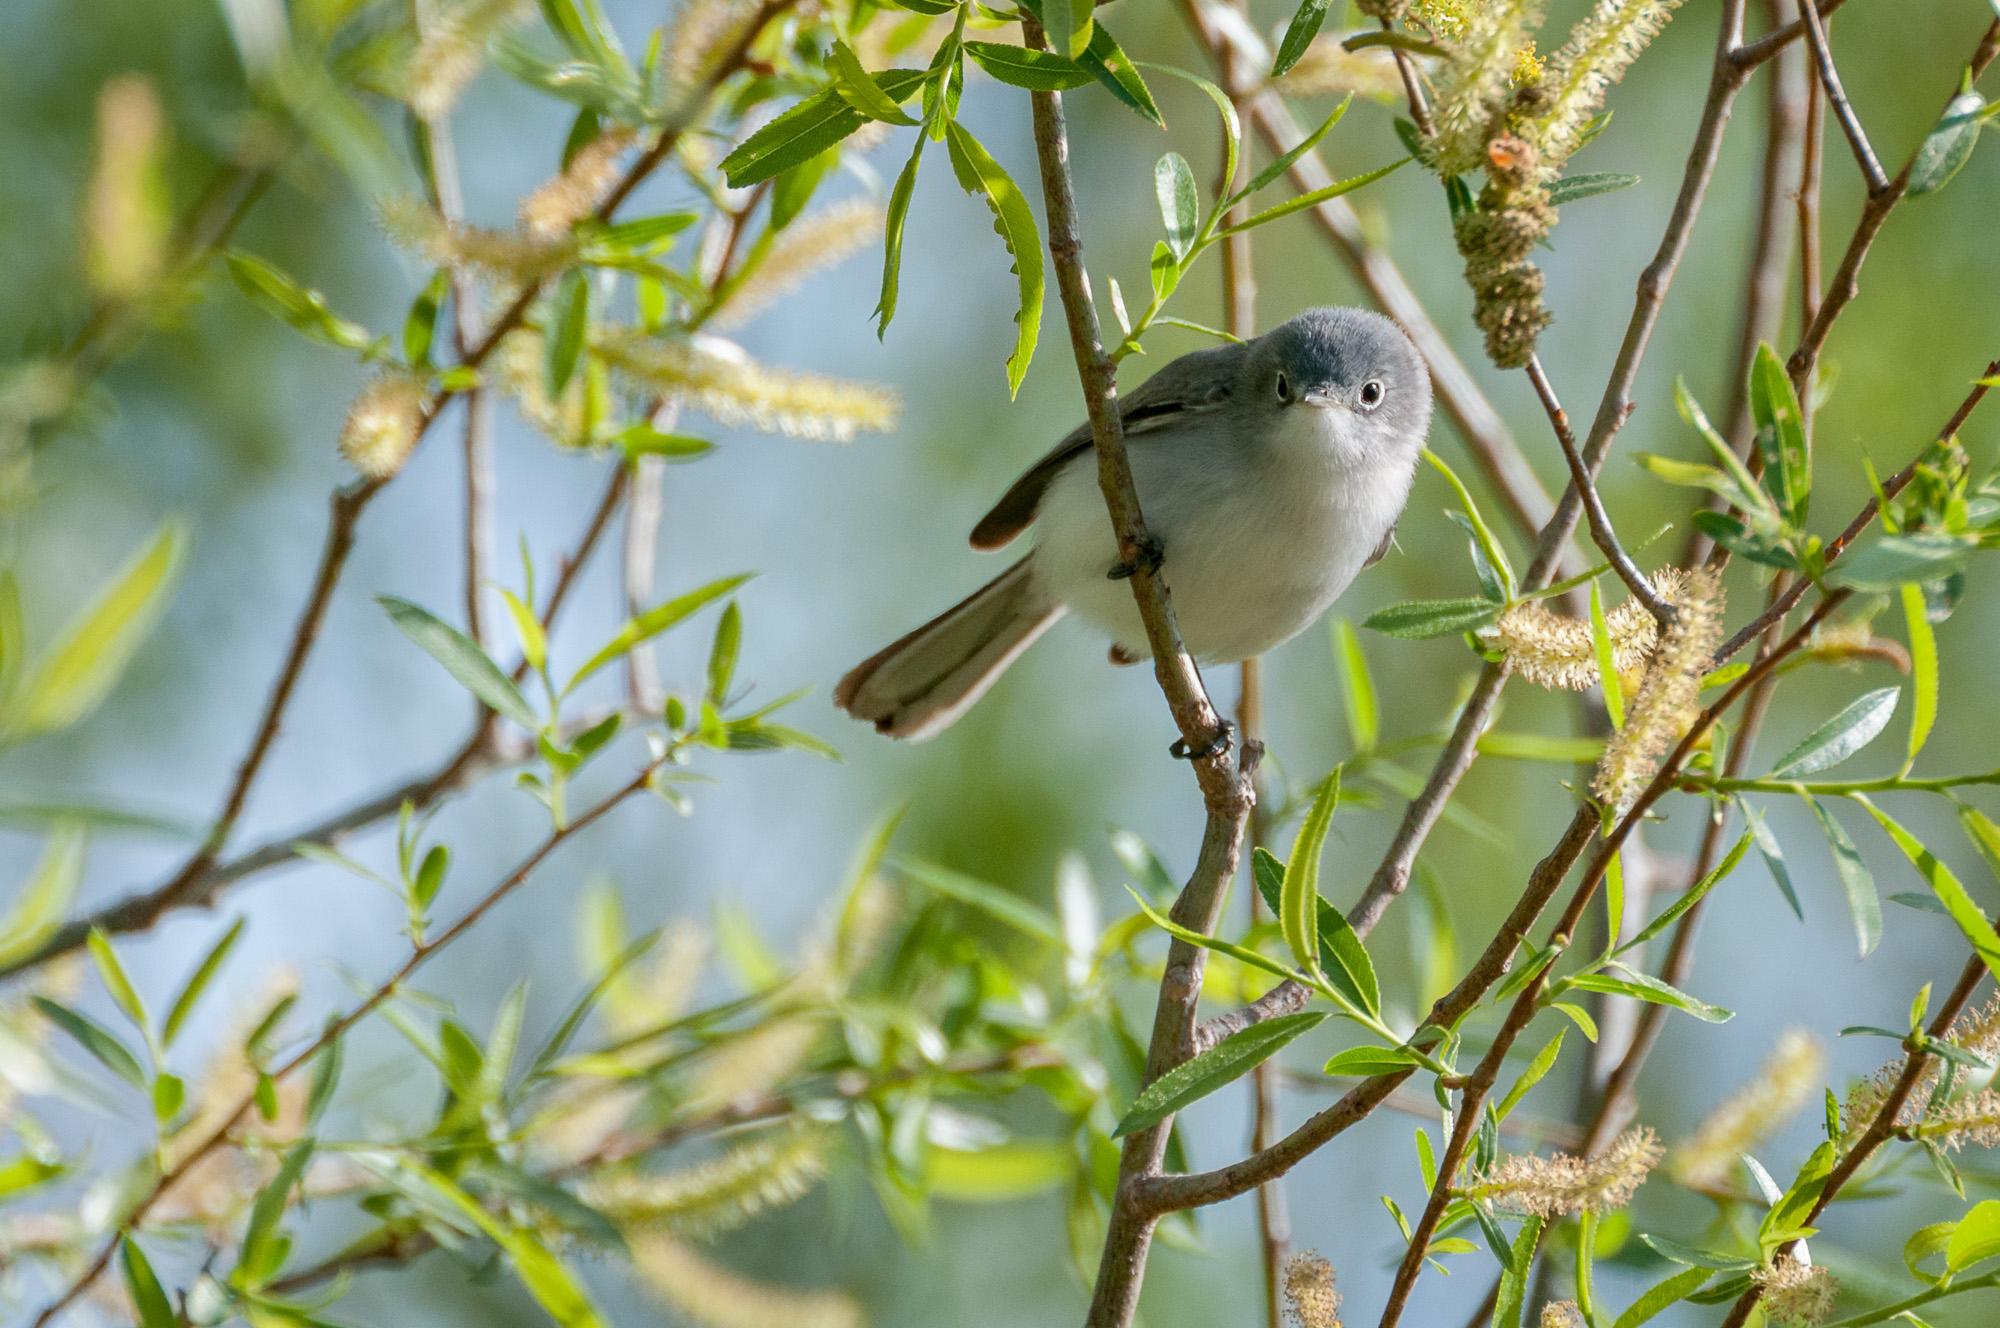 Female Blue-Gray Gnatcatcher sitting on a branch